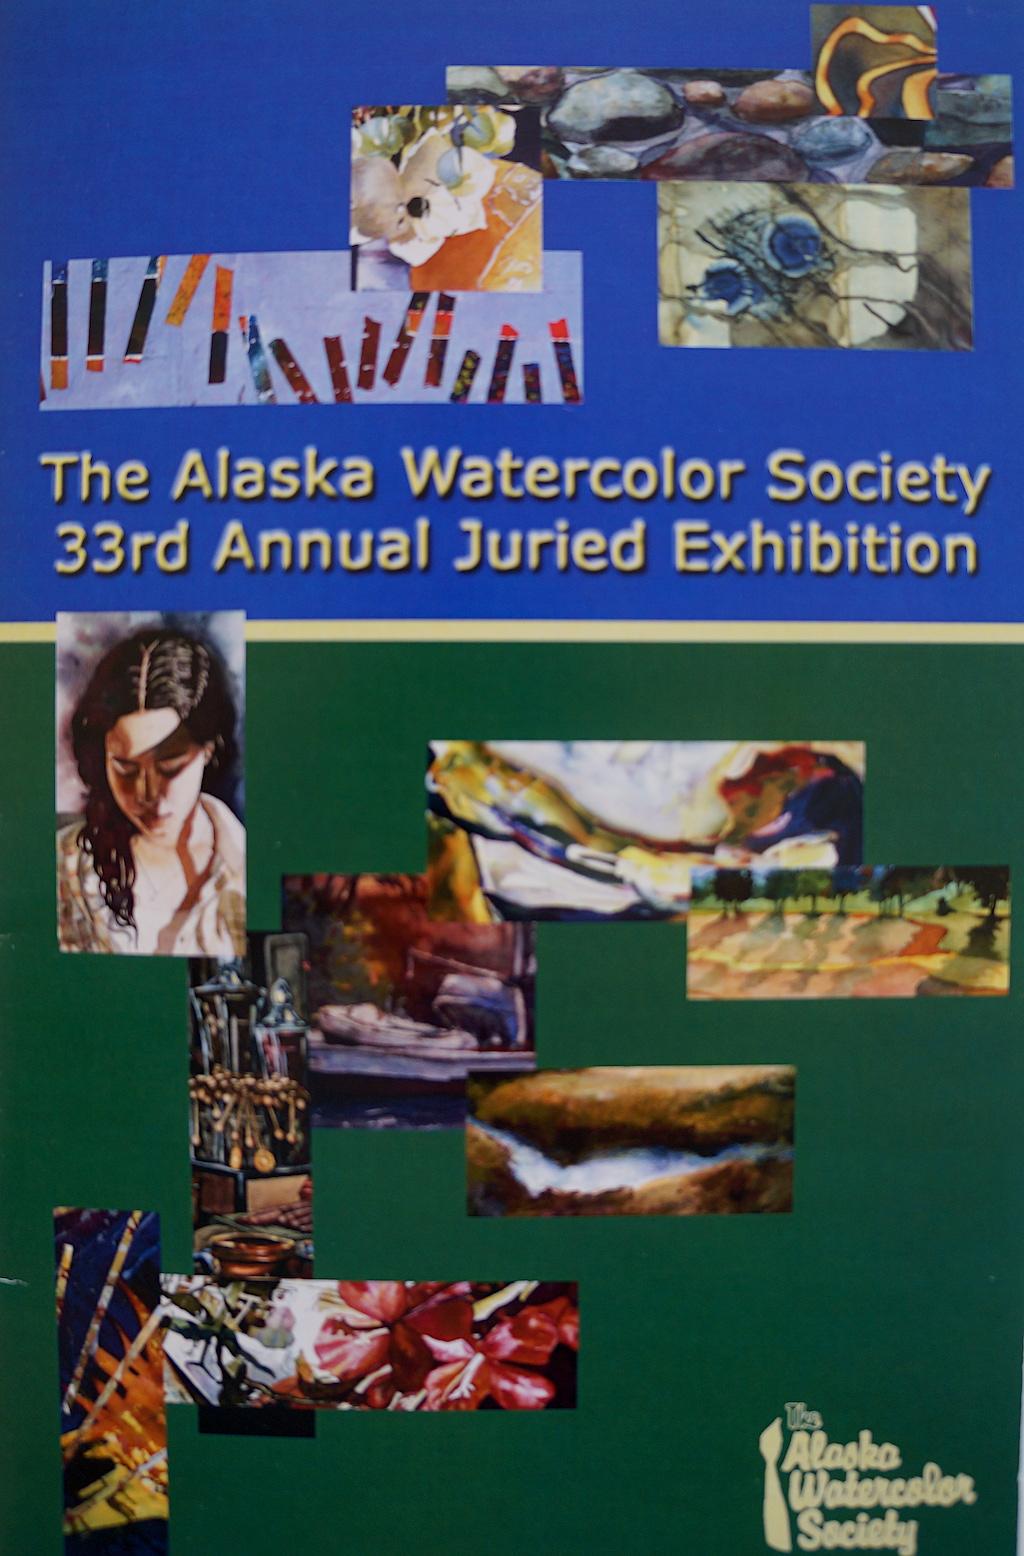 AlaskaWS 33rd